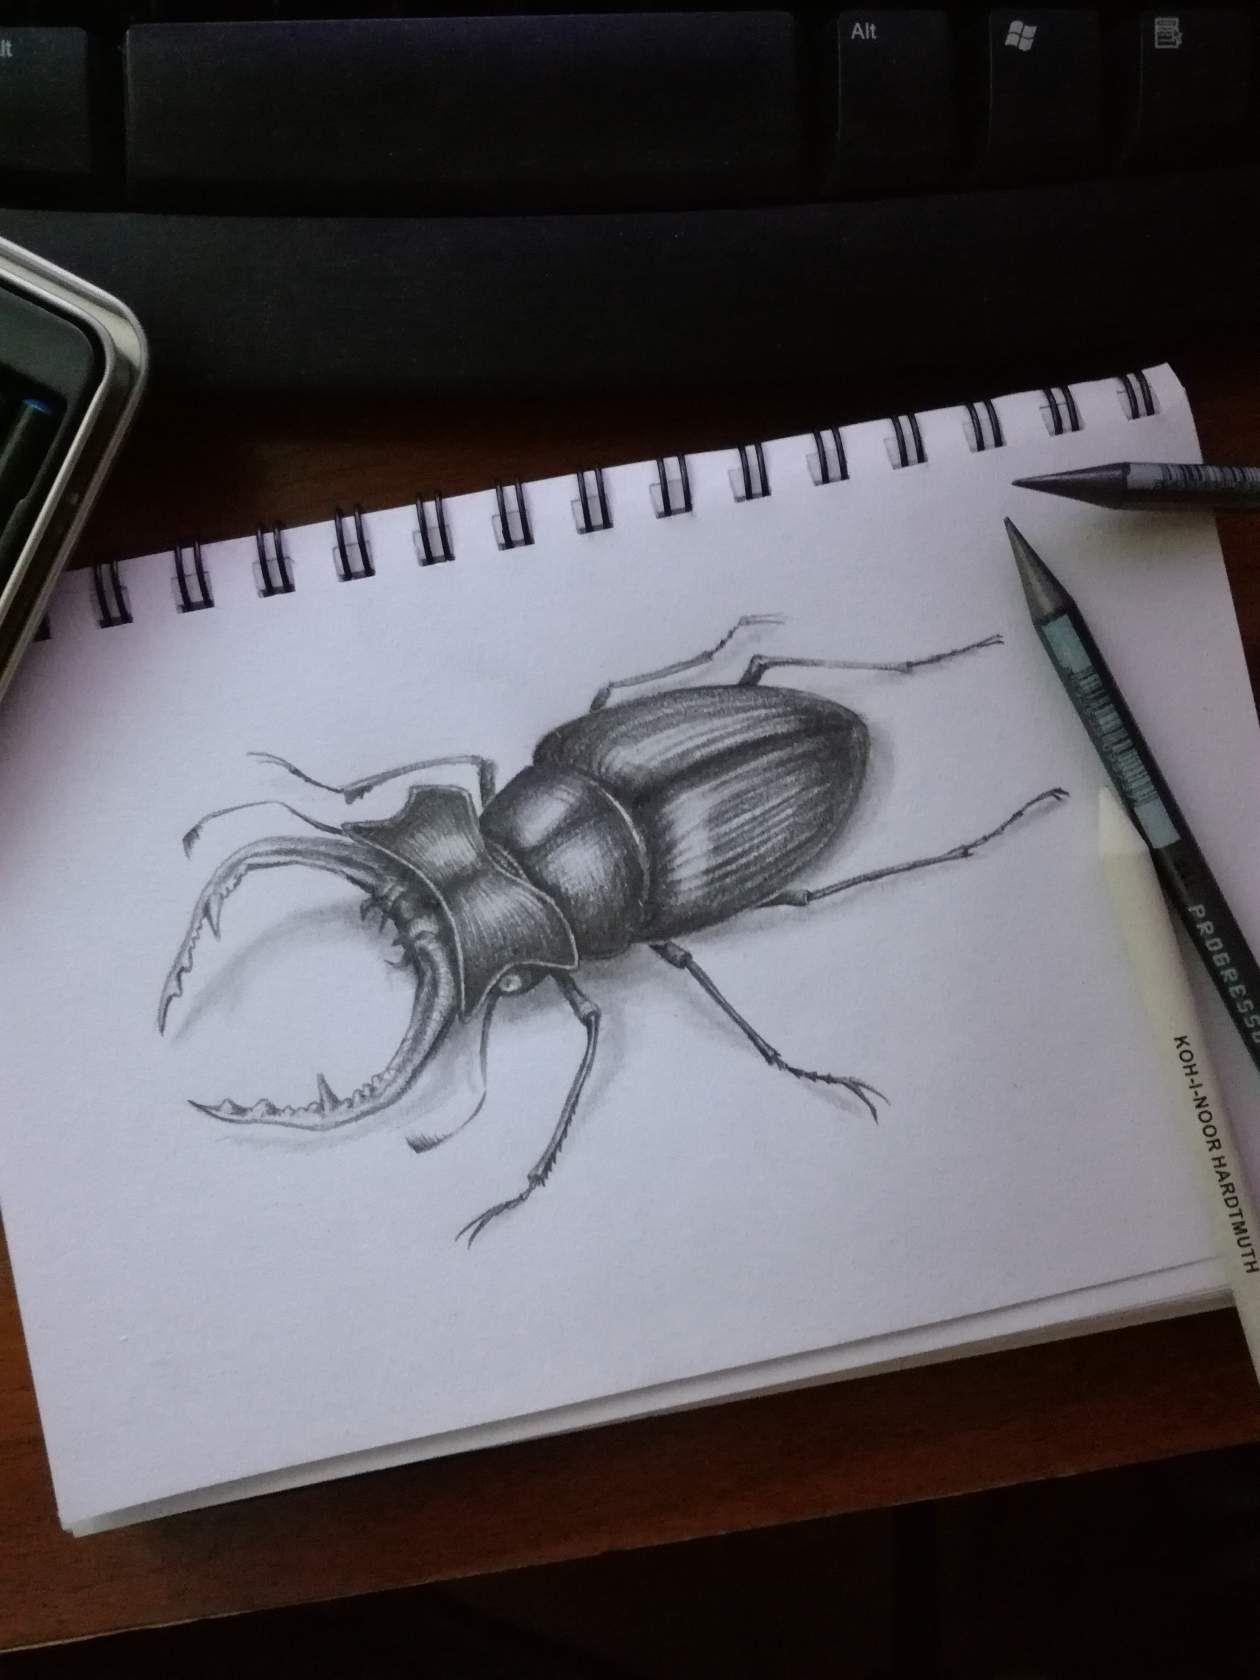 Картинка нарисованного жука-оленя